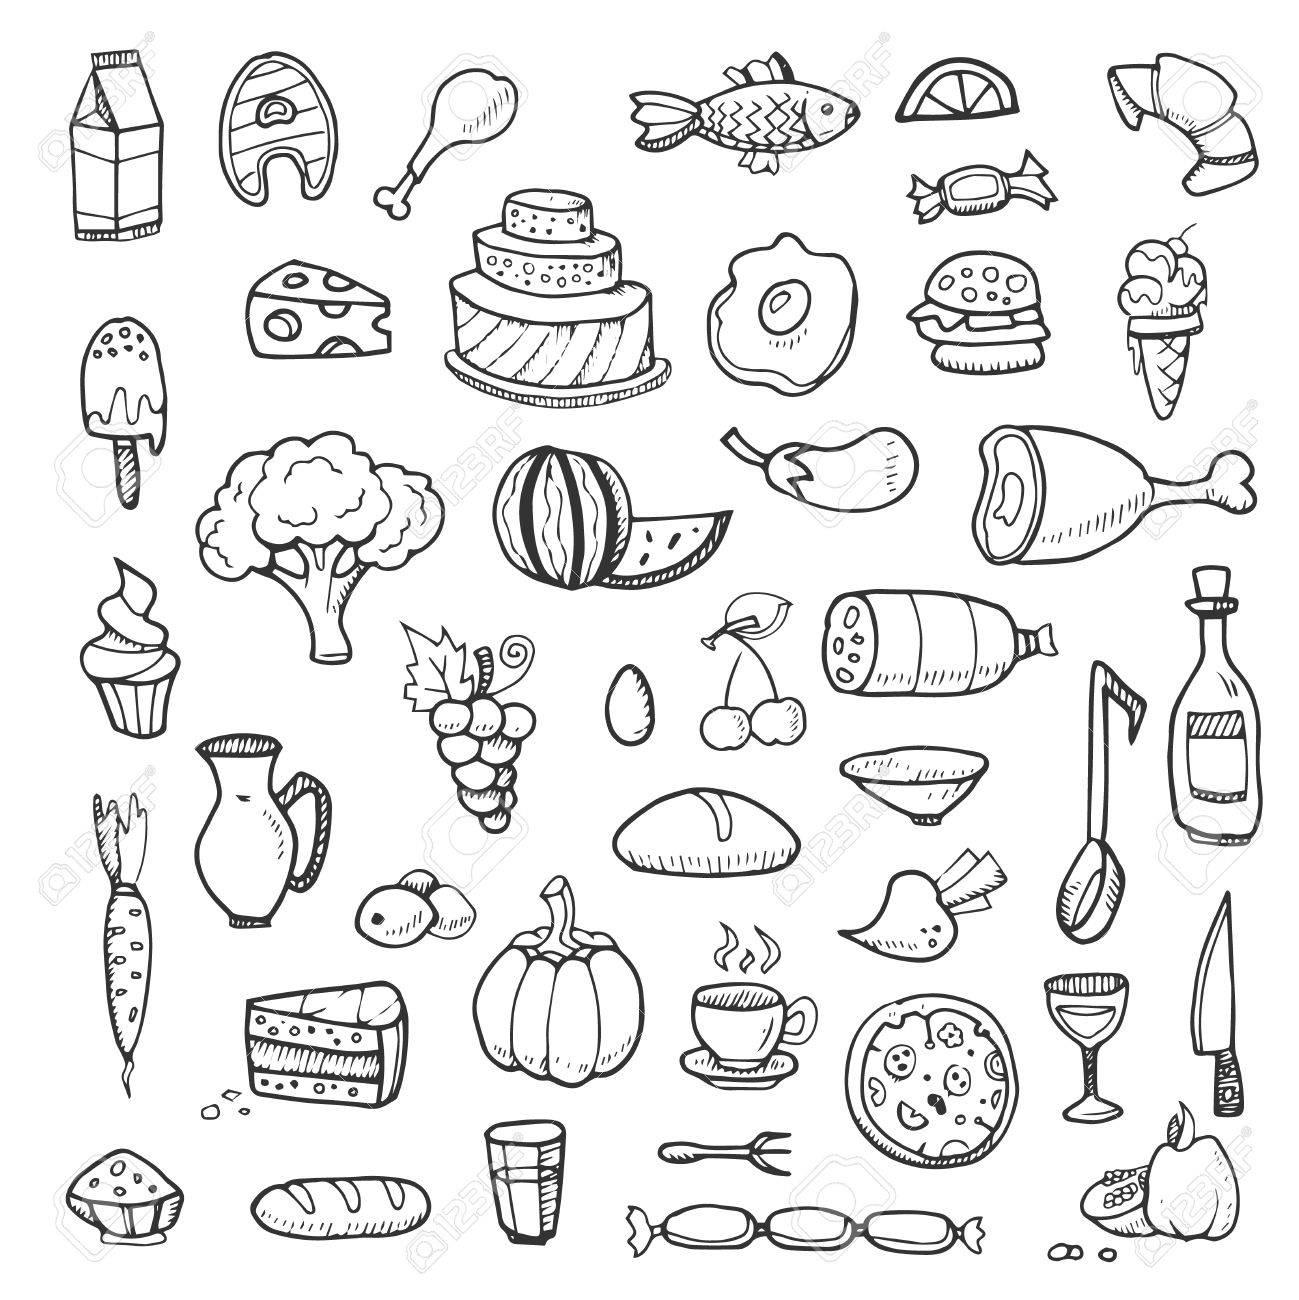 1299x1300 Food, Vegetables, Drinks, Snacks, Fast Food Doodle Sketch Hand